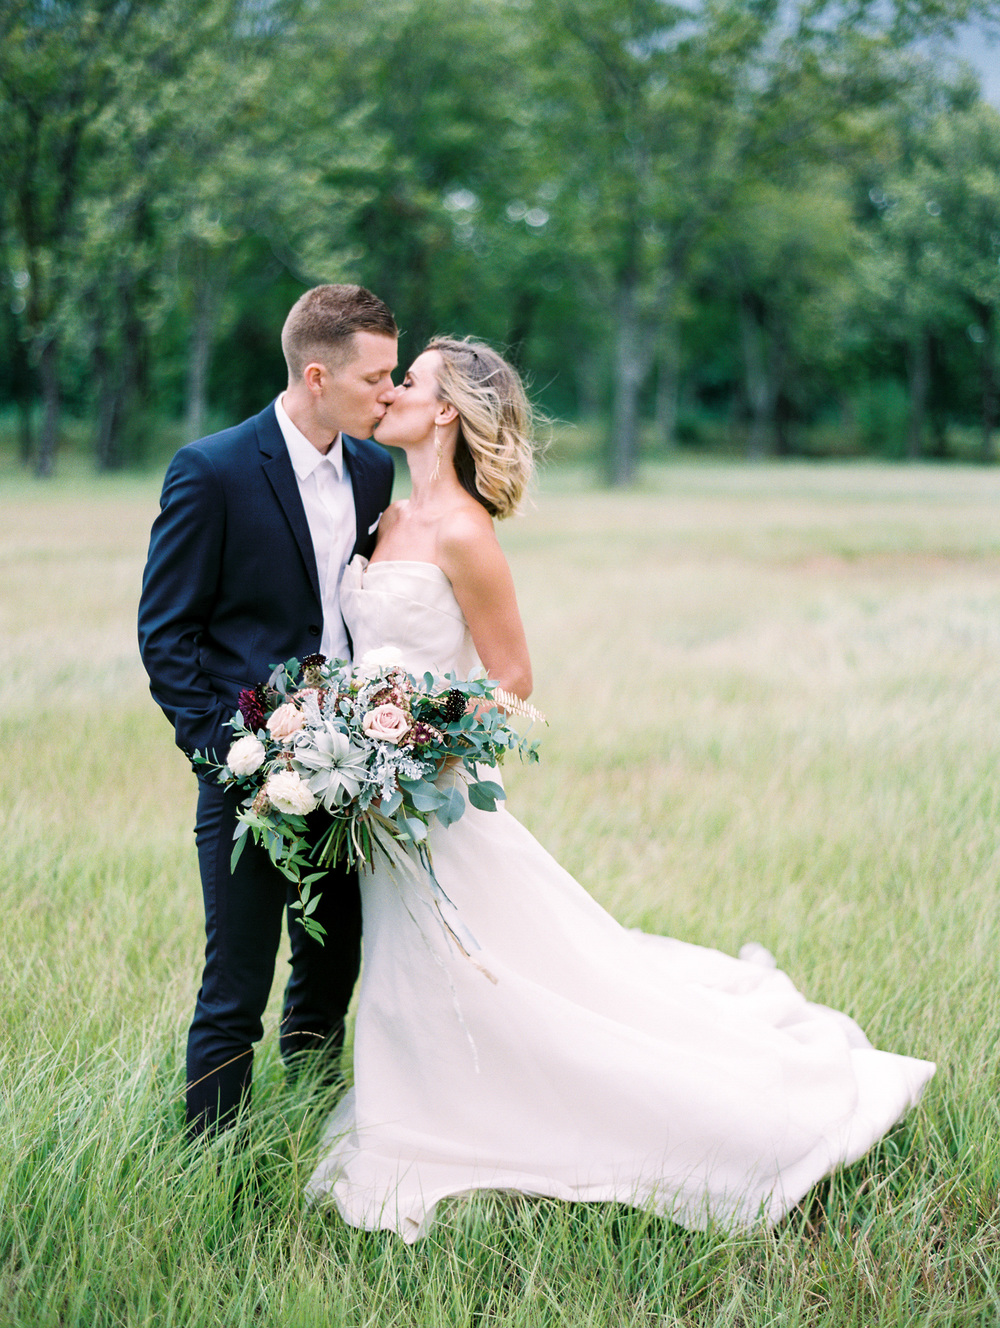 Dana-Fernandez-Photography-Houston-Wedding-Photographer-Film-100-Layer-Cake-Wedding-Inspiration-Destination-4.jpg